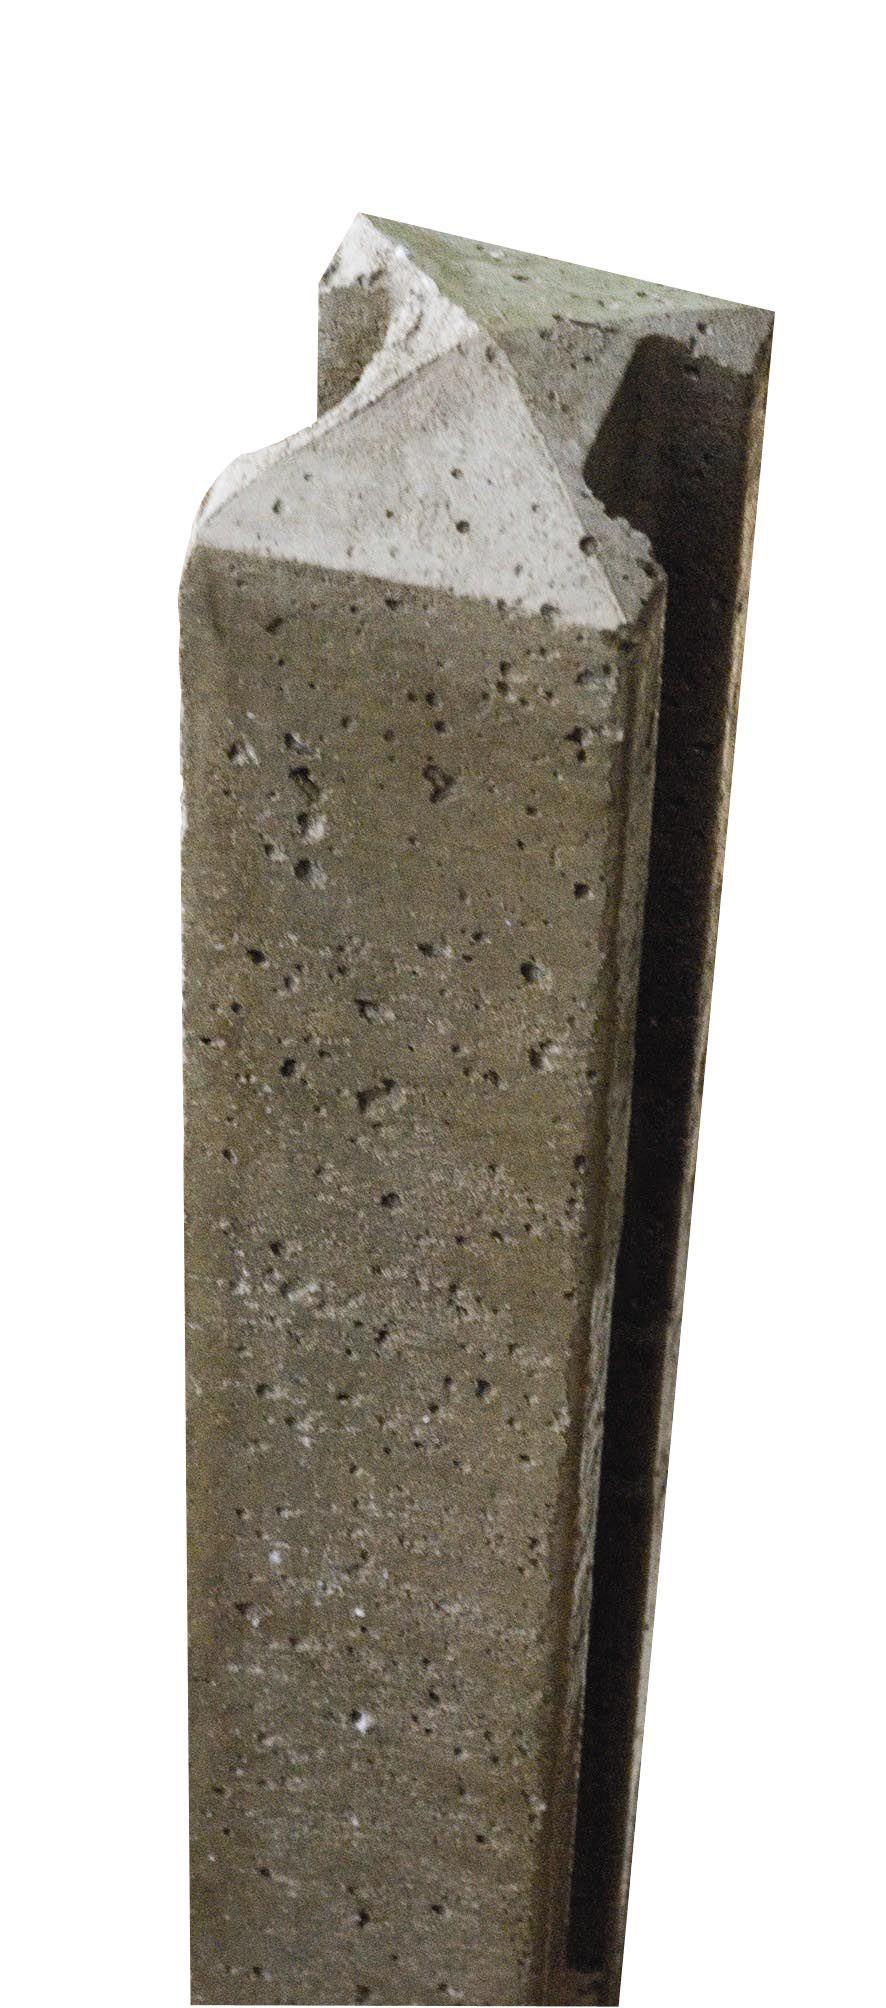 Grange Concrete Fence Post H 1 75m Departments Diy At B Amp Q